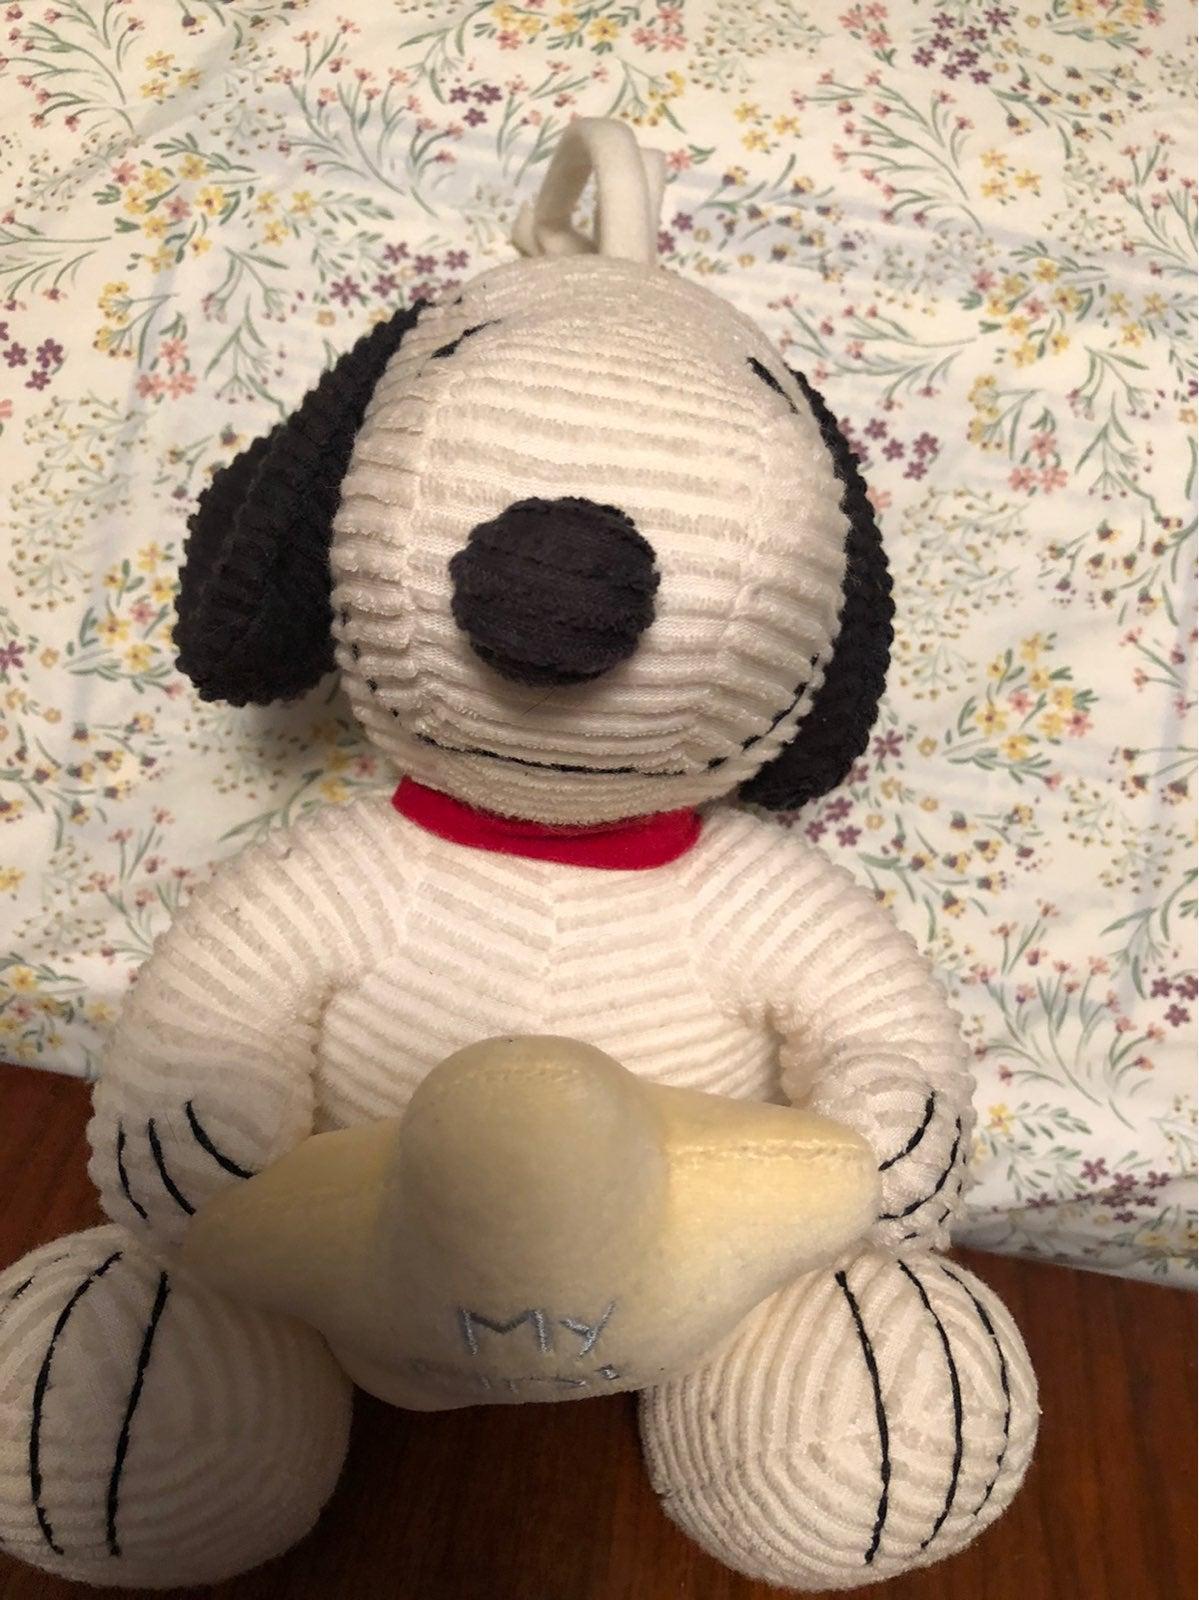 My First Snoopy Plush